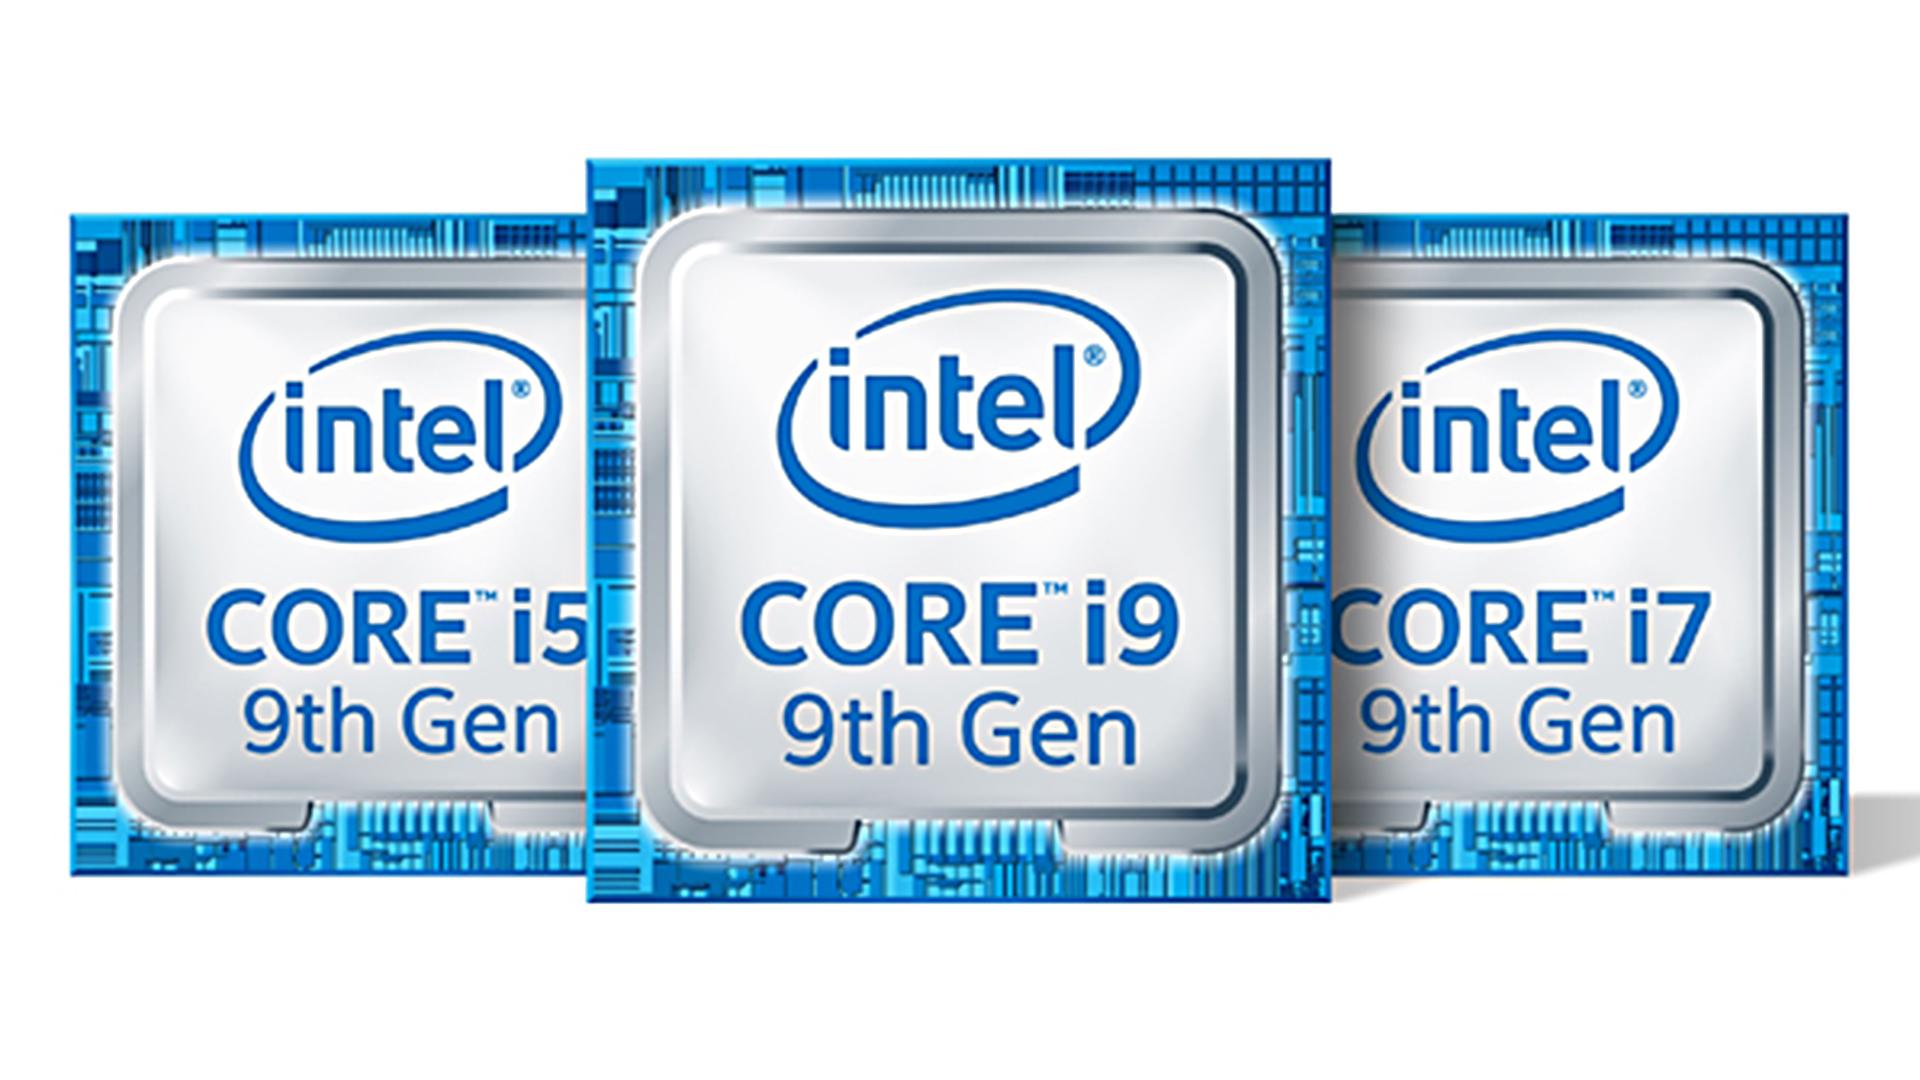 Intel Announces New 9th Gen Desktop Processors Gameaxis